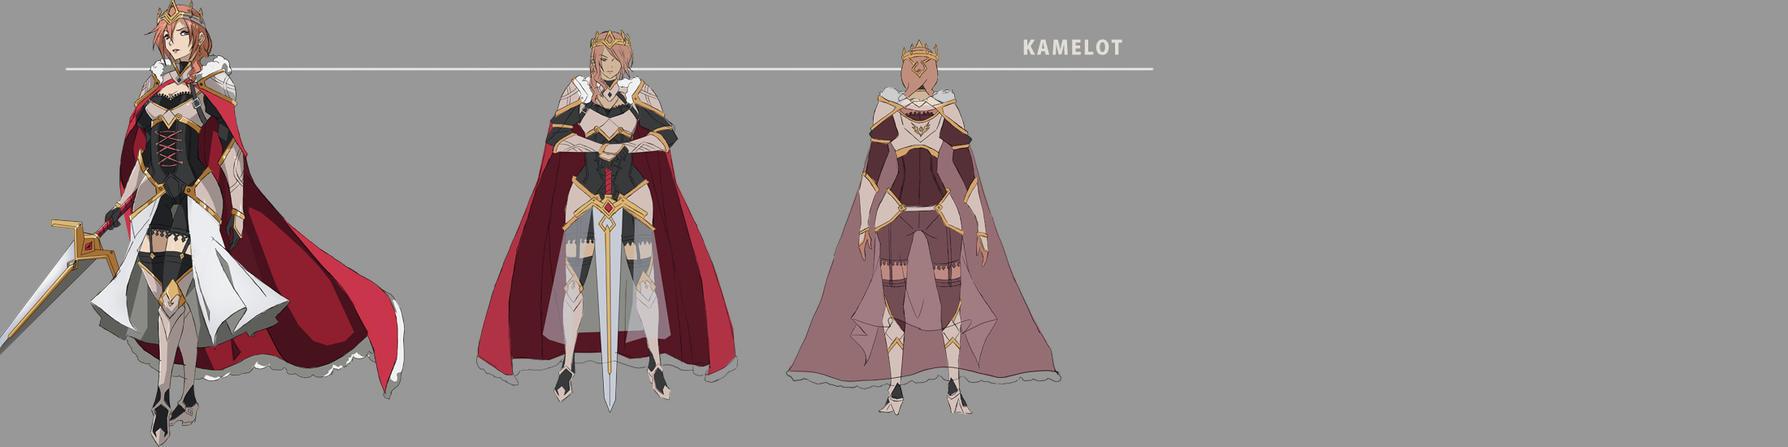 Kameloth by P-Shinobi